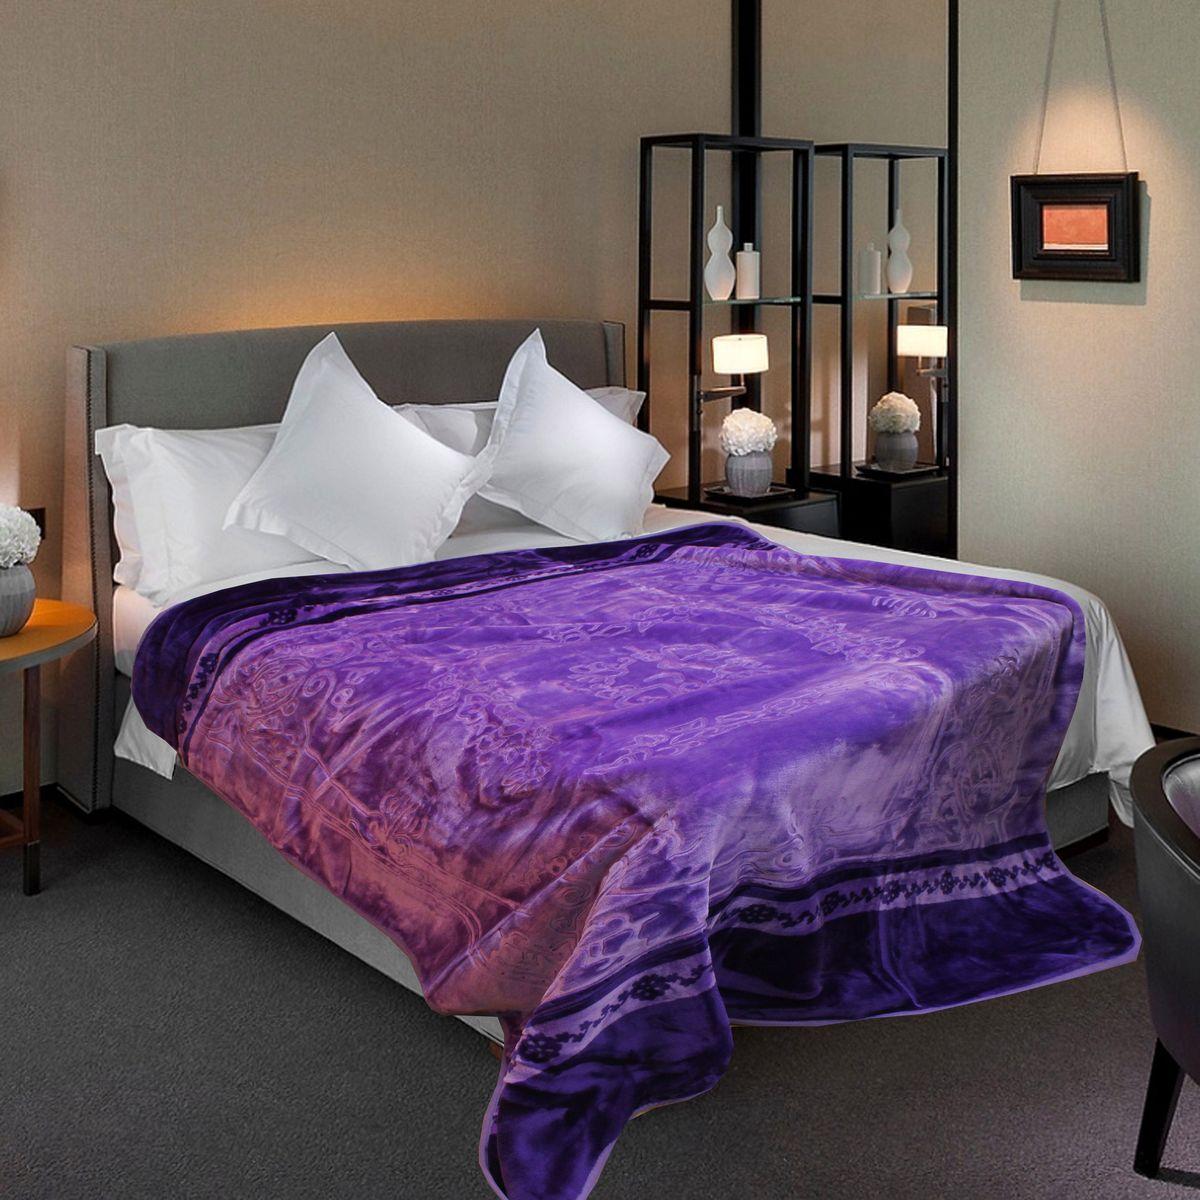 Плед TexRepublic, 160 х 220 см, цвет: фиолетовый67243